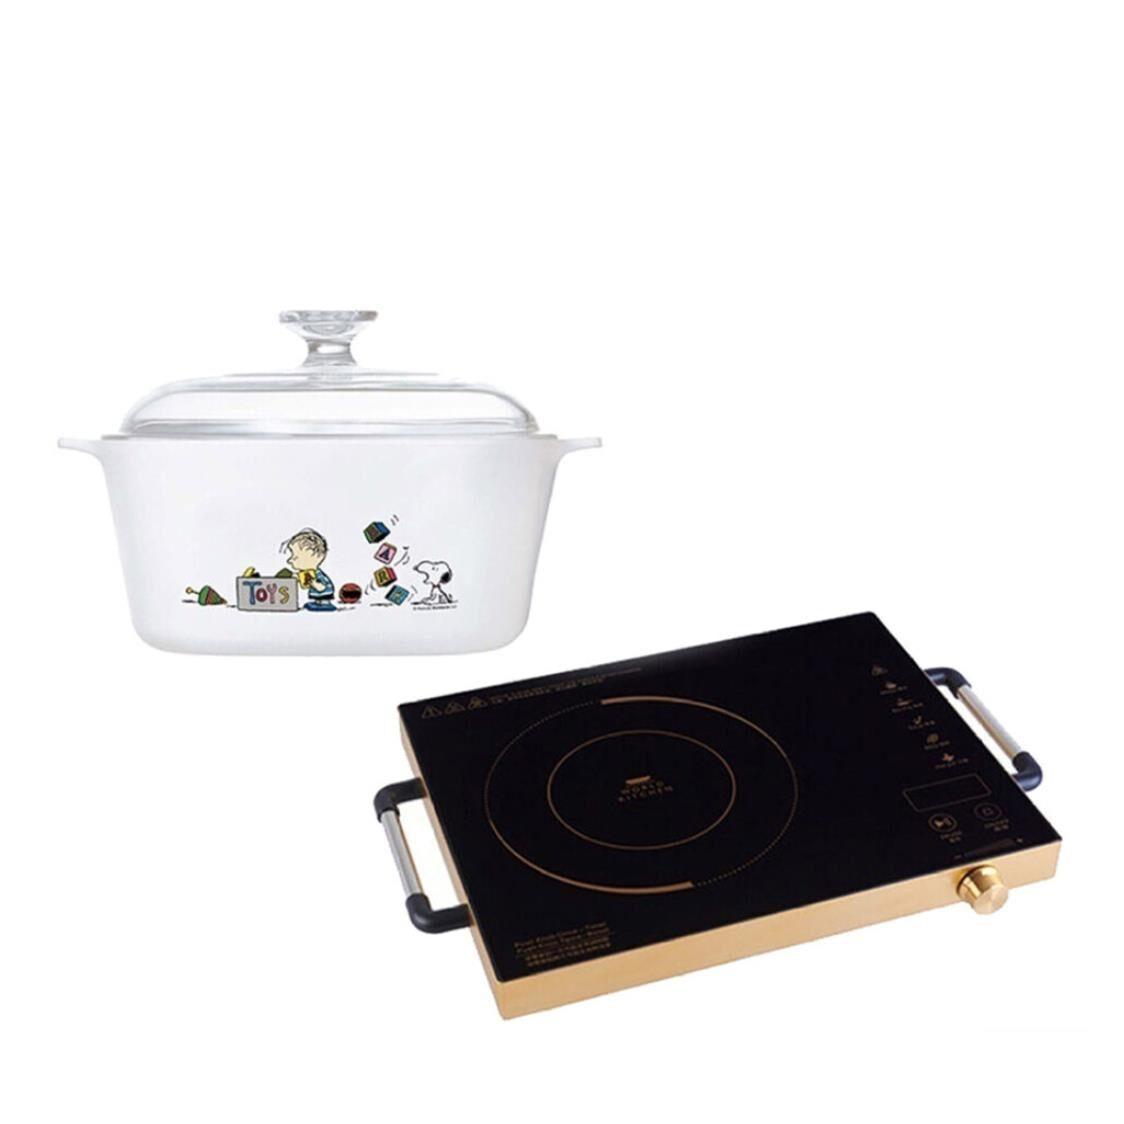 Corningware 5L Covered Casserole  FOC World Kitchen High Heat Cooker worth 79